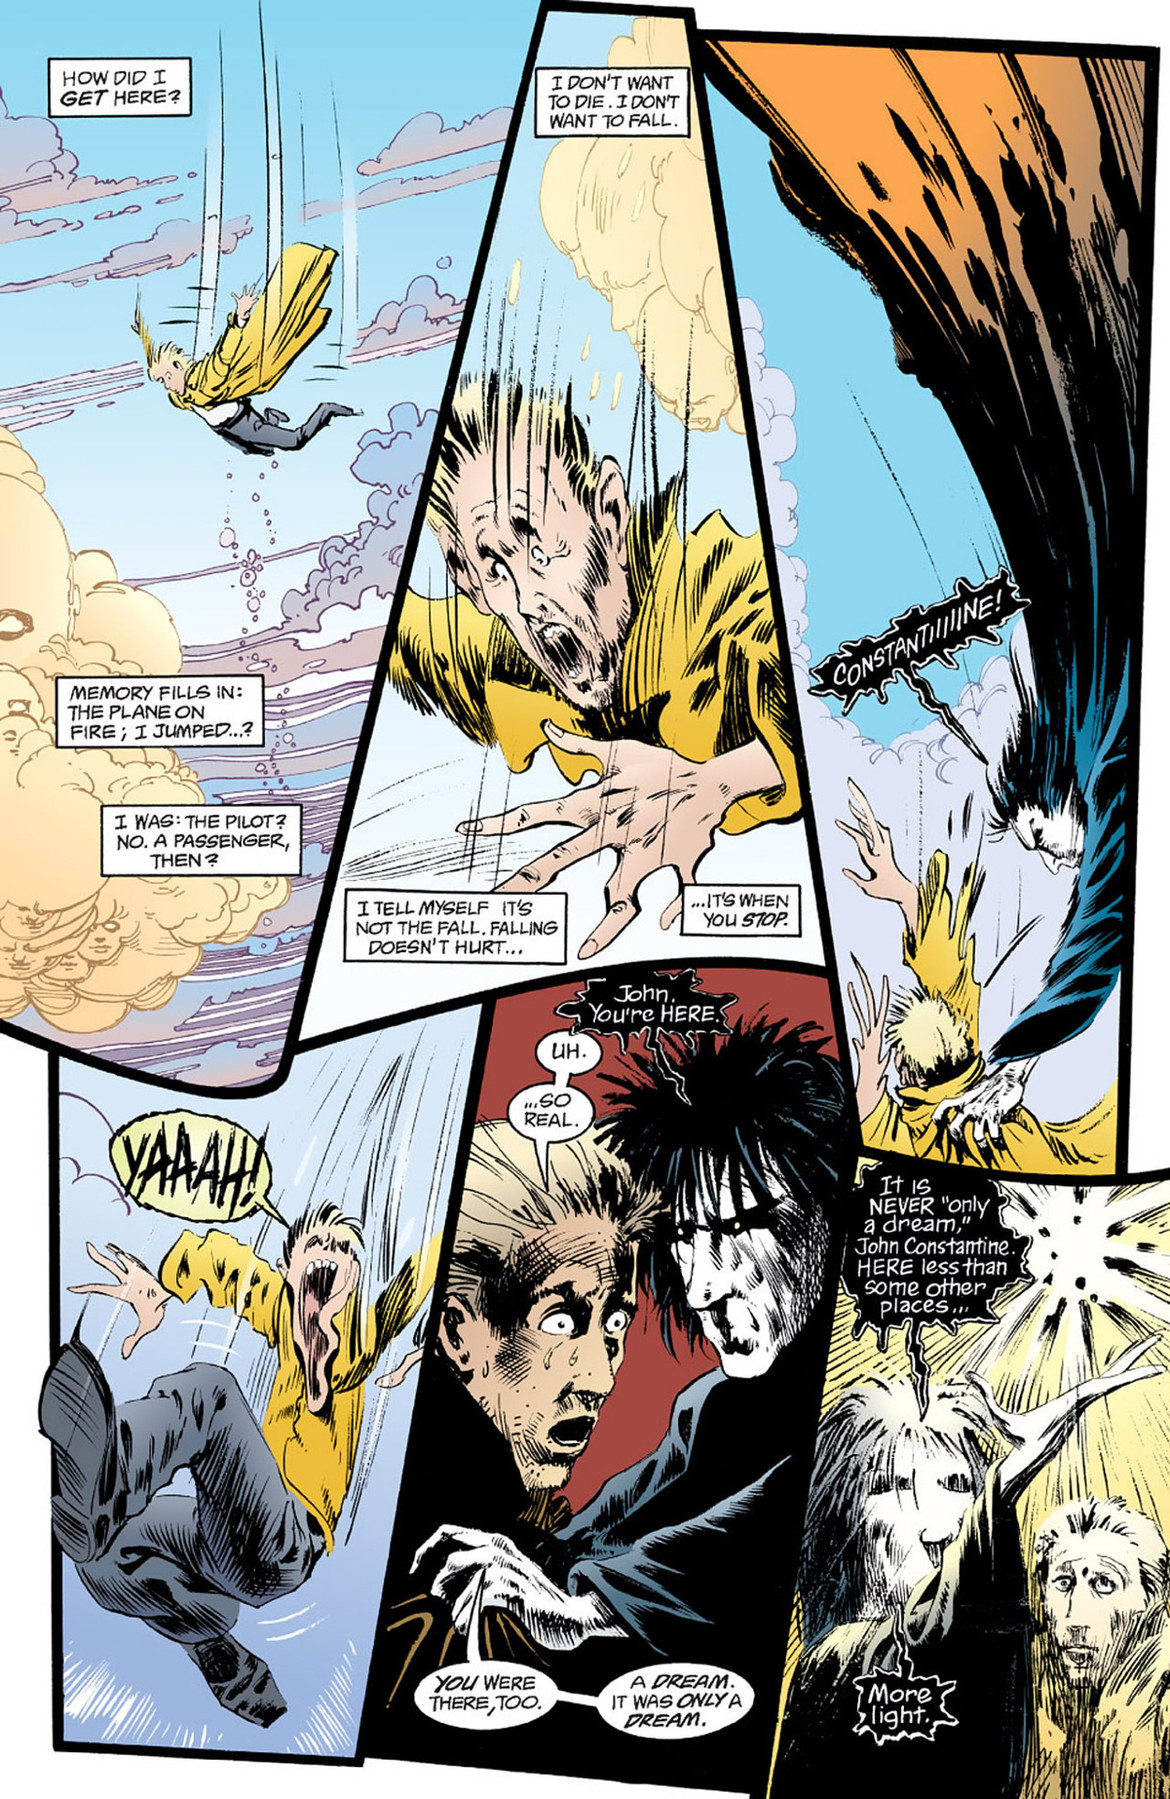 John Constantine and Sandman #3